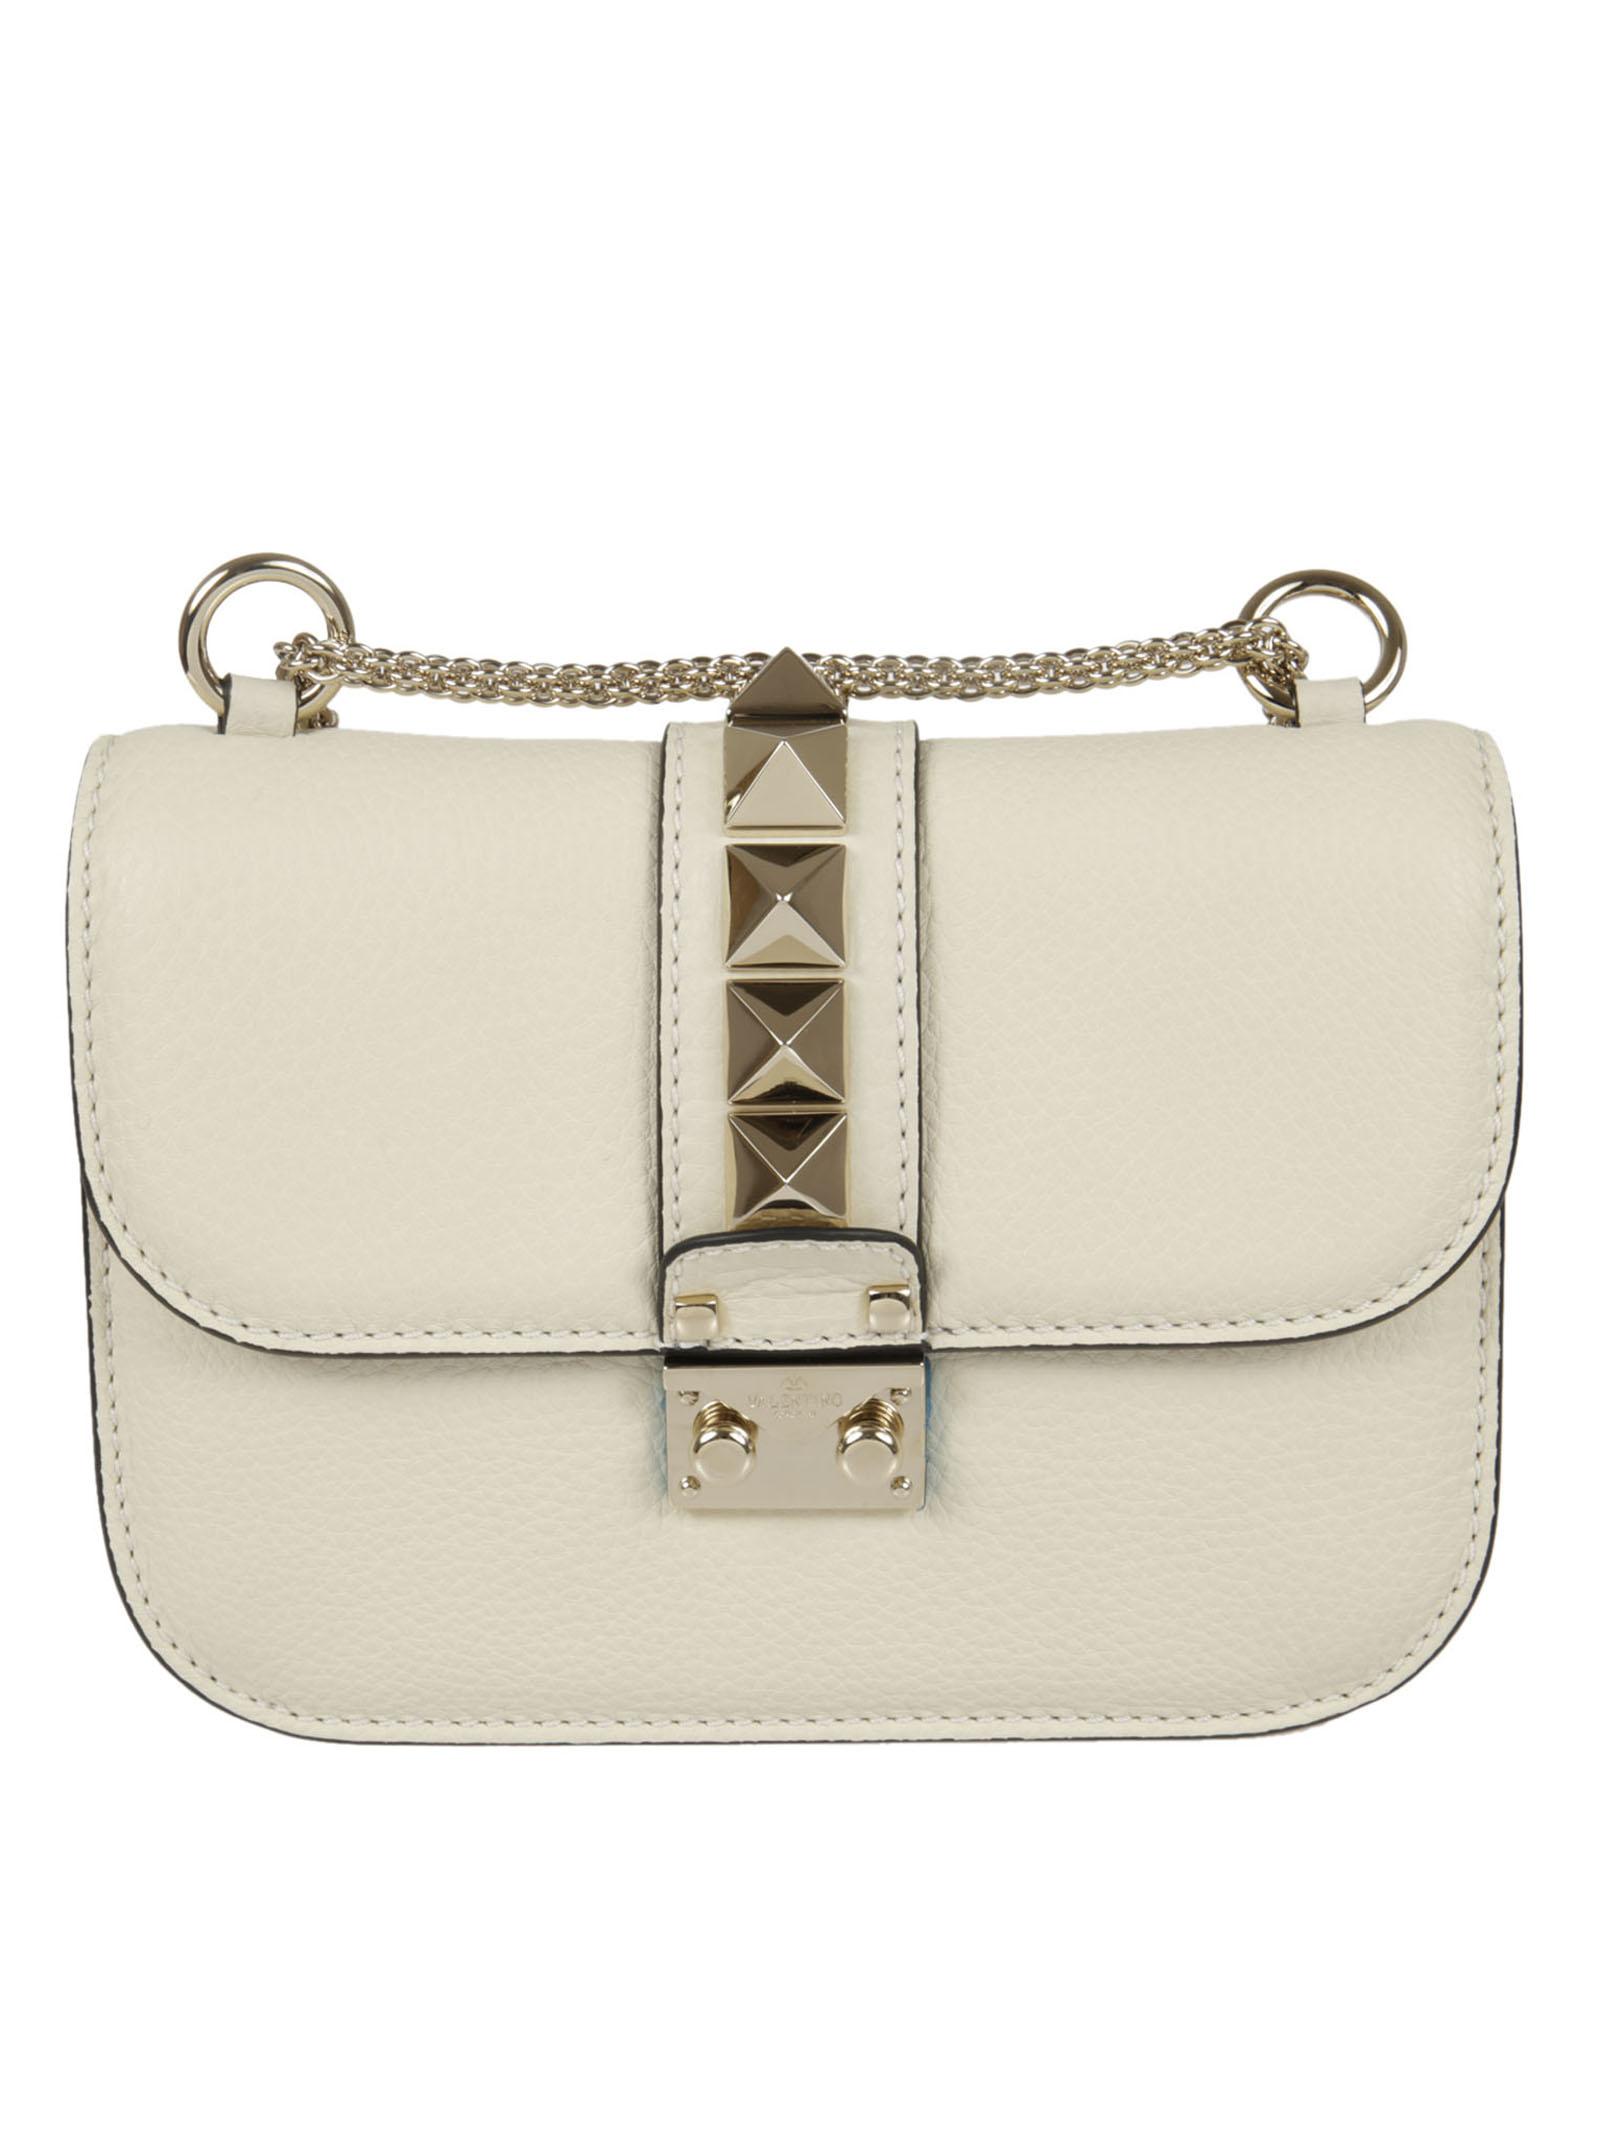 Valentino Garavani Valentino Glam Lock Shoulder Bag